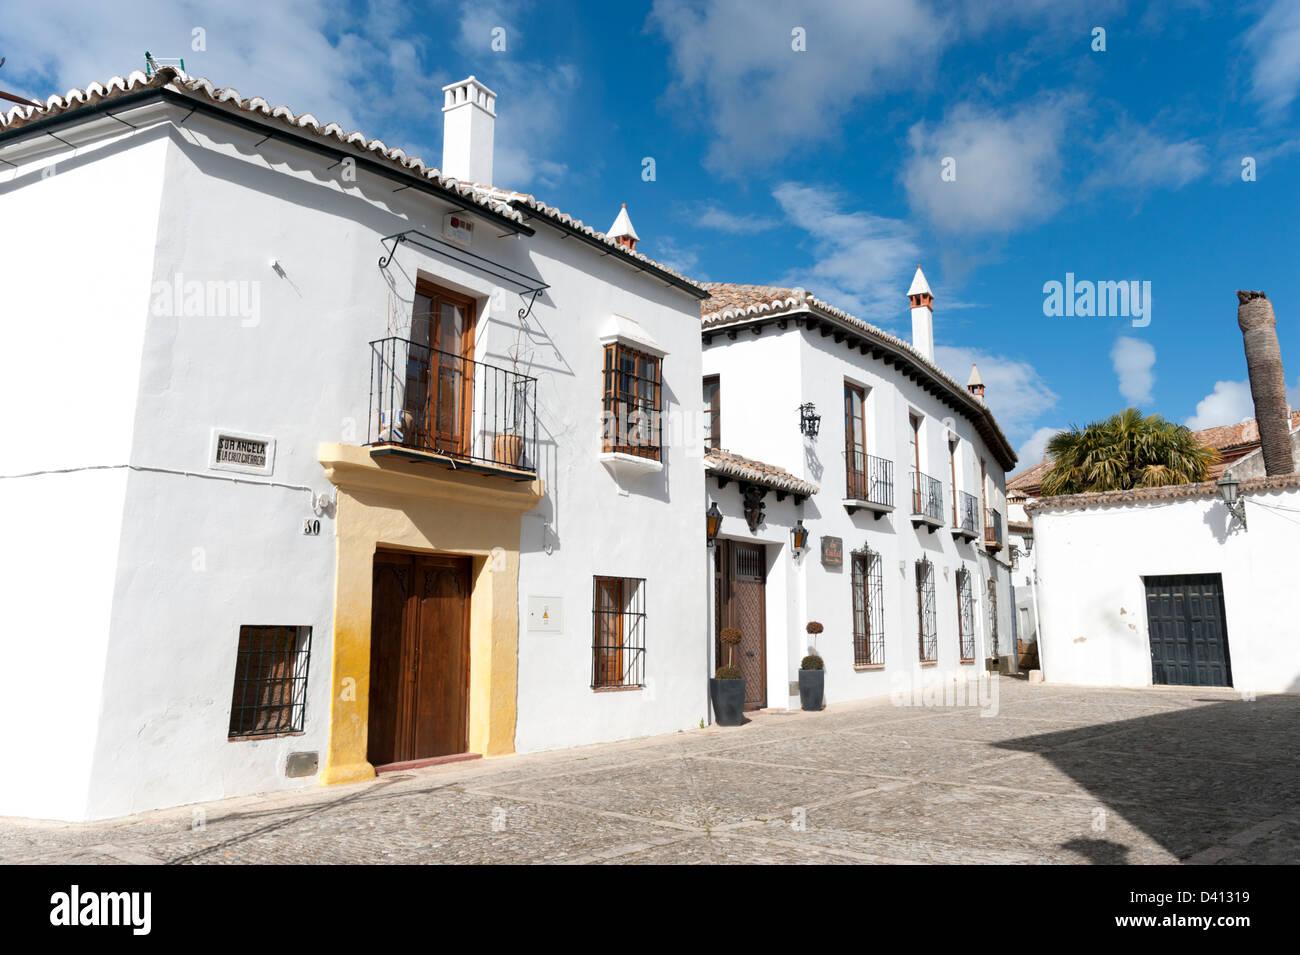 Row of whitewashed houses, Ronda, Spain - Stock Image